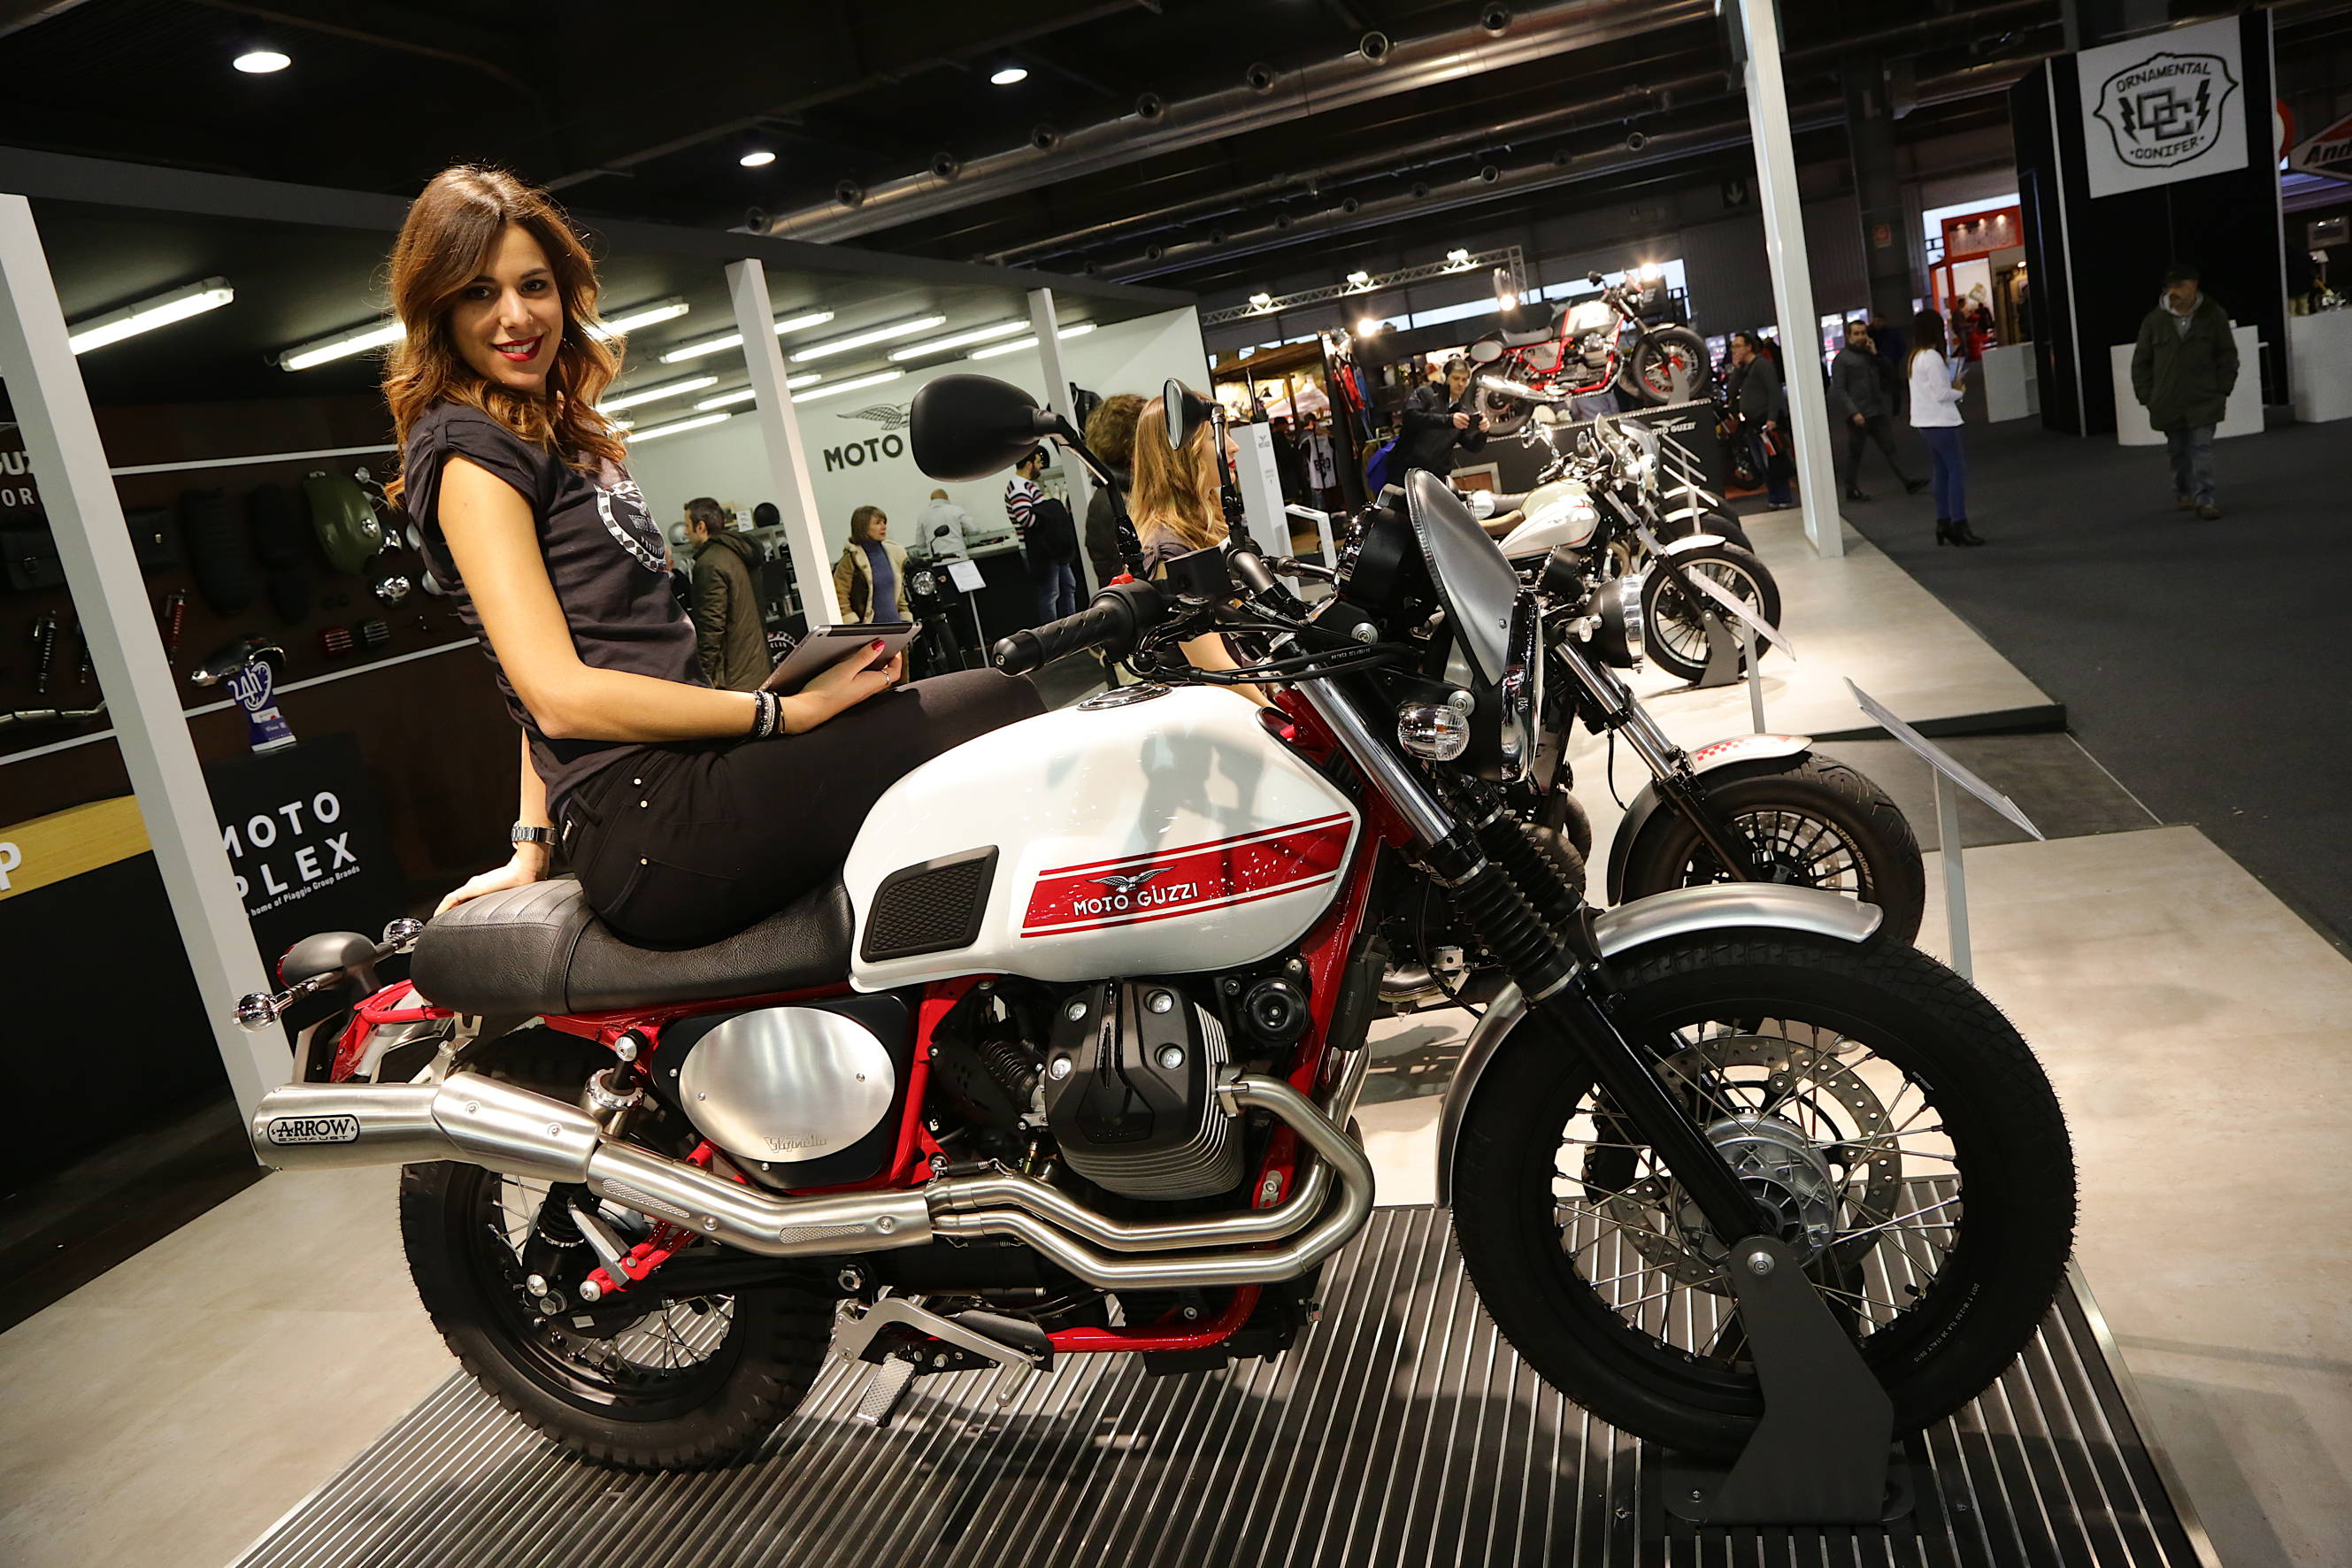 Motor Bike Show 2016 a Verona